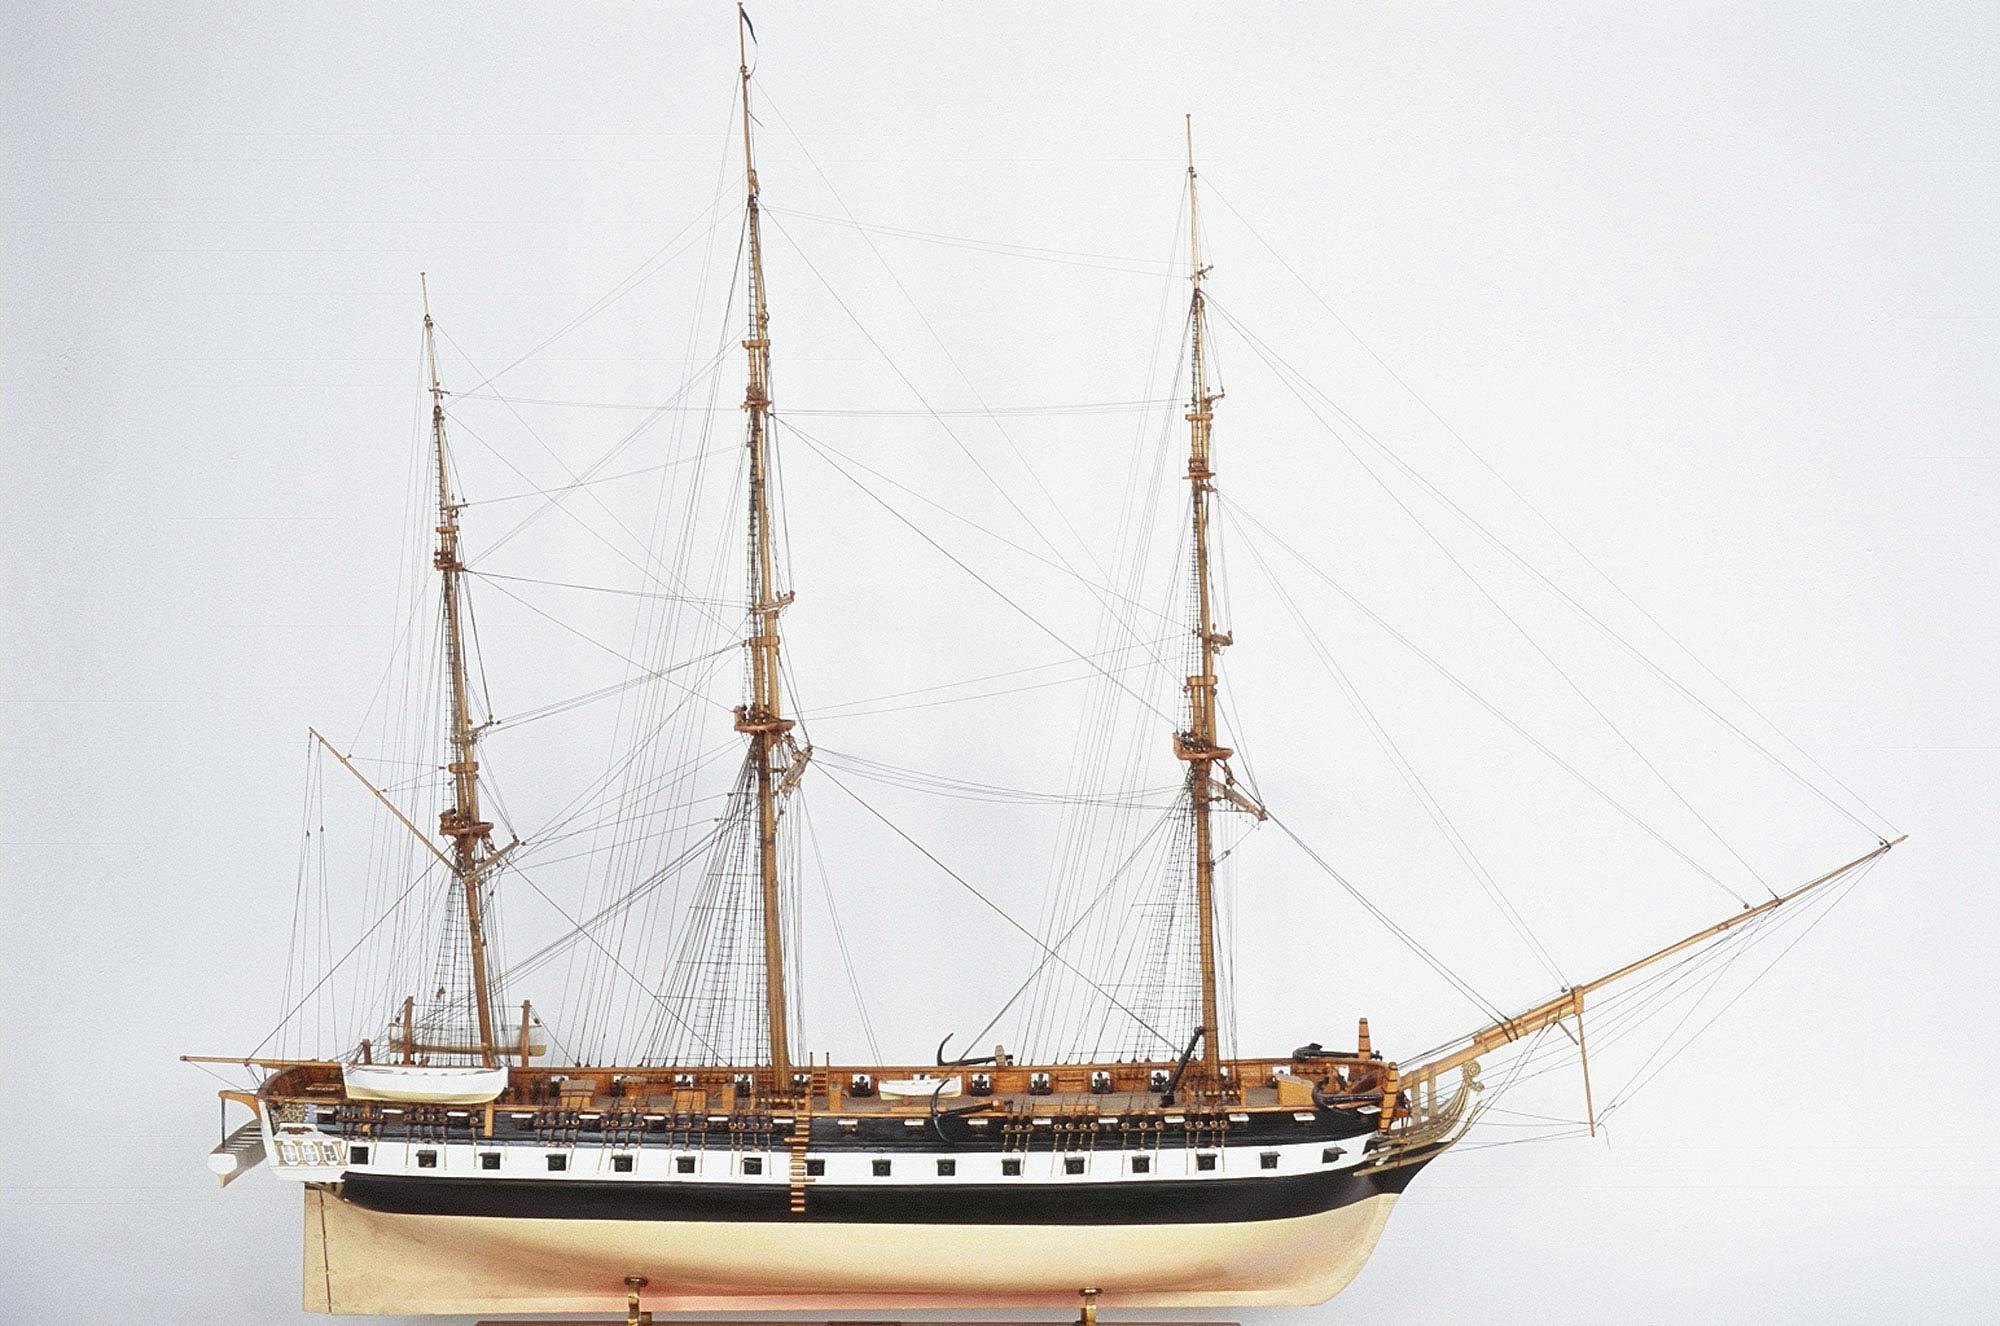 2121jpg Hellasu0027 Greek Frigate 1826 With Plans